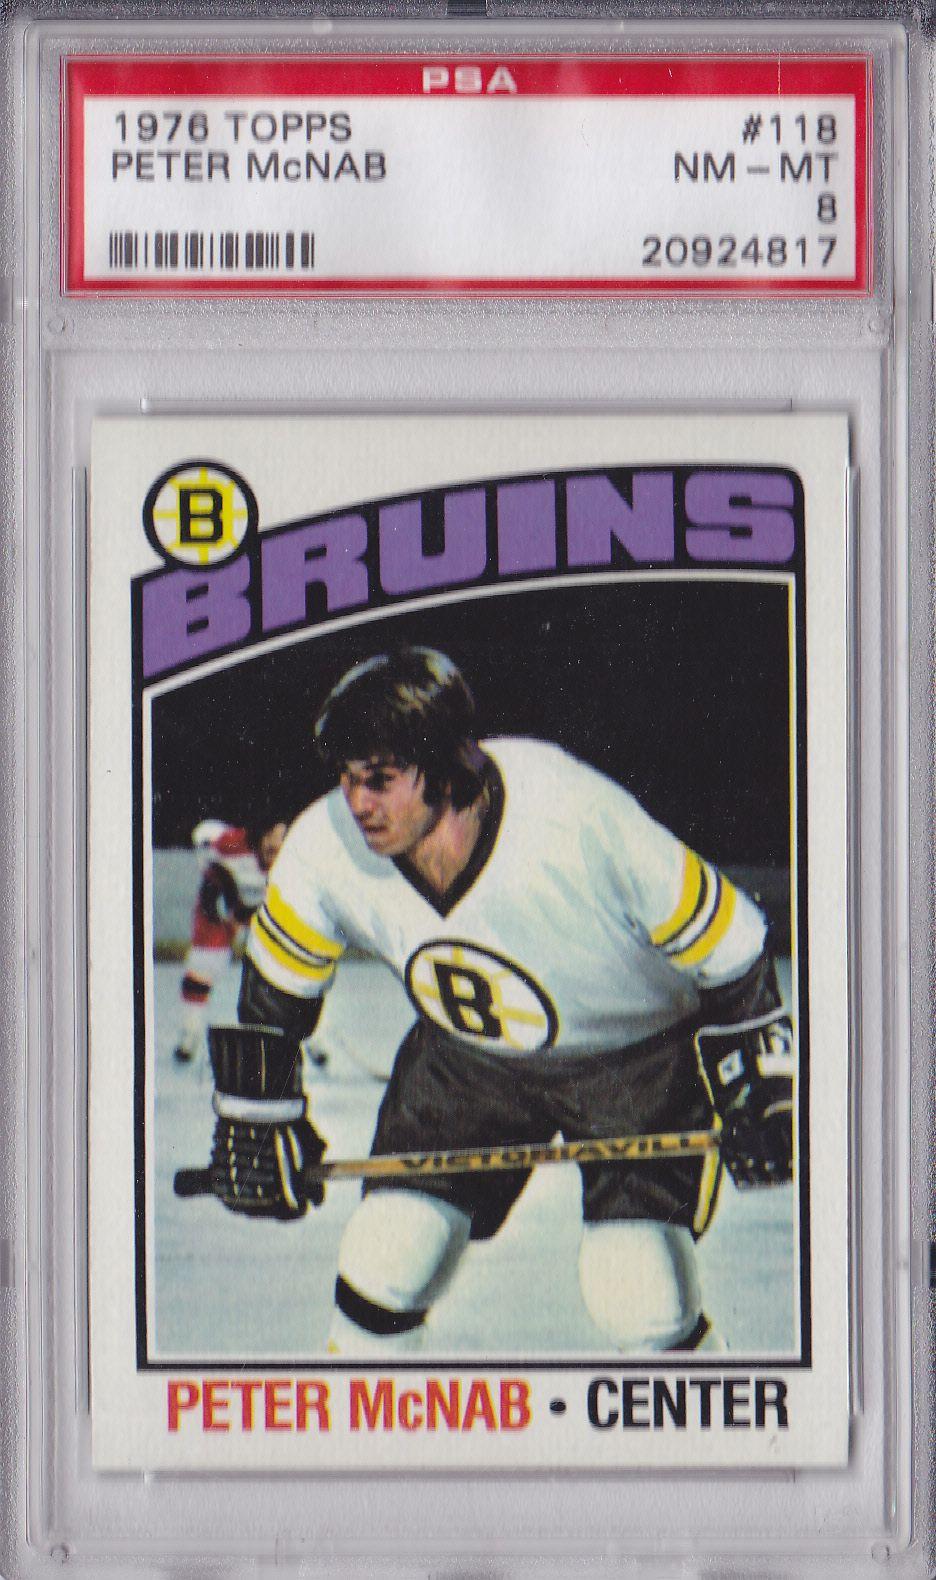 197576 Topps Peter McNab 118 Hockey cards